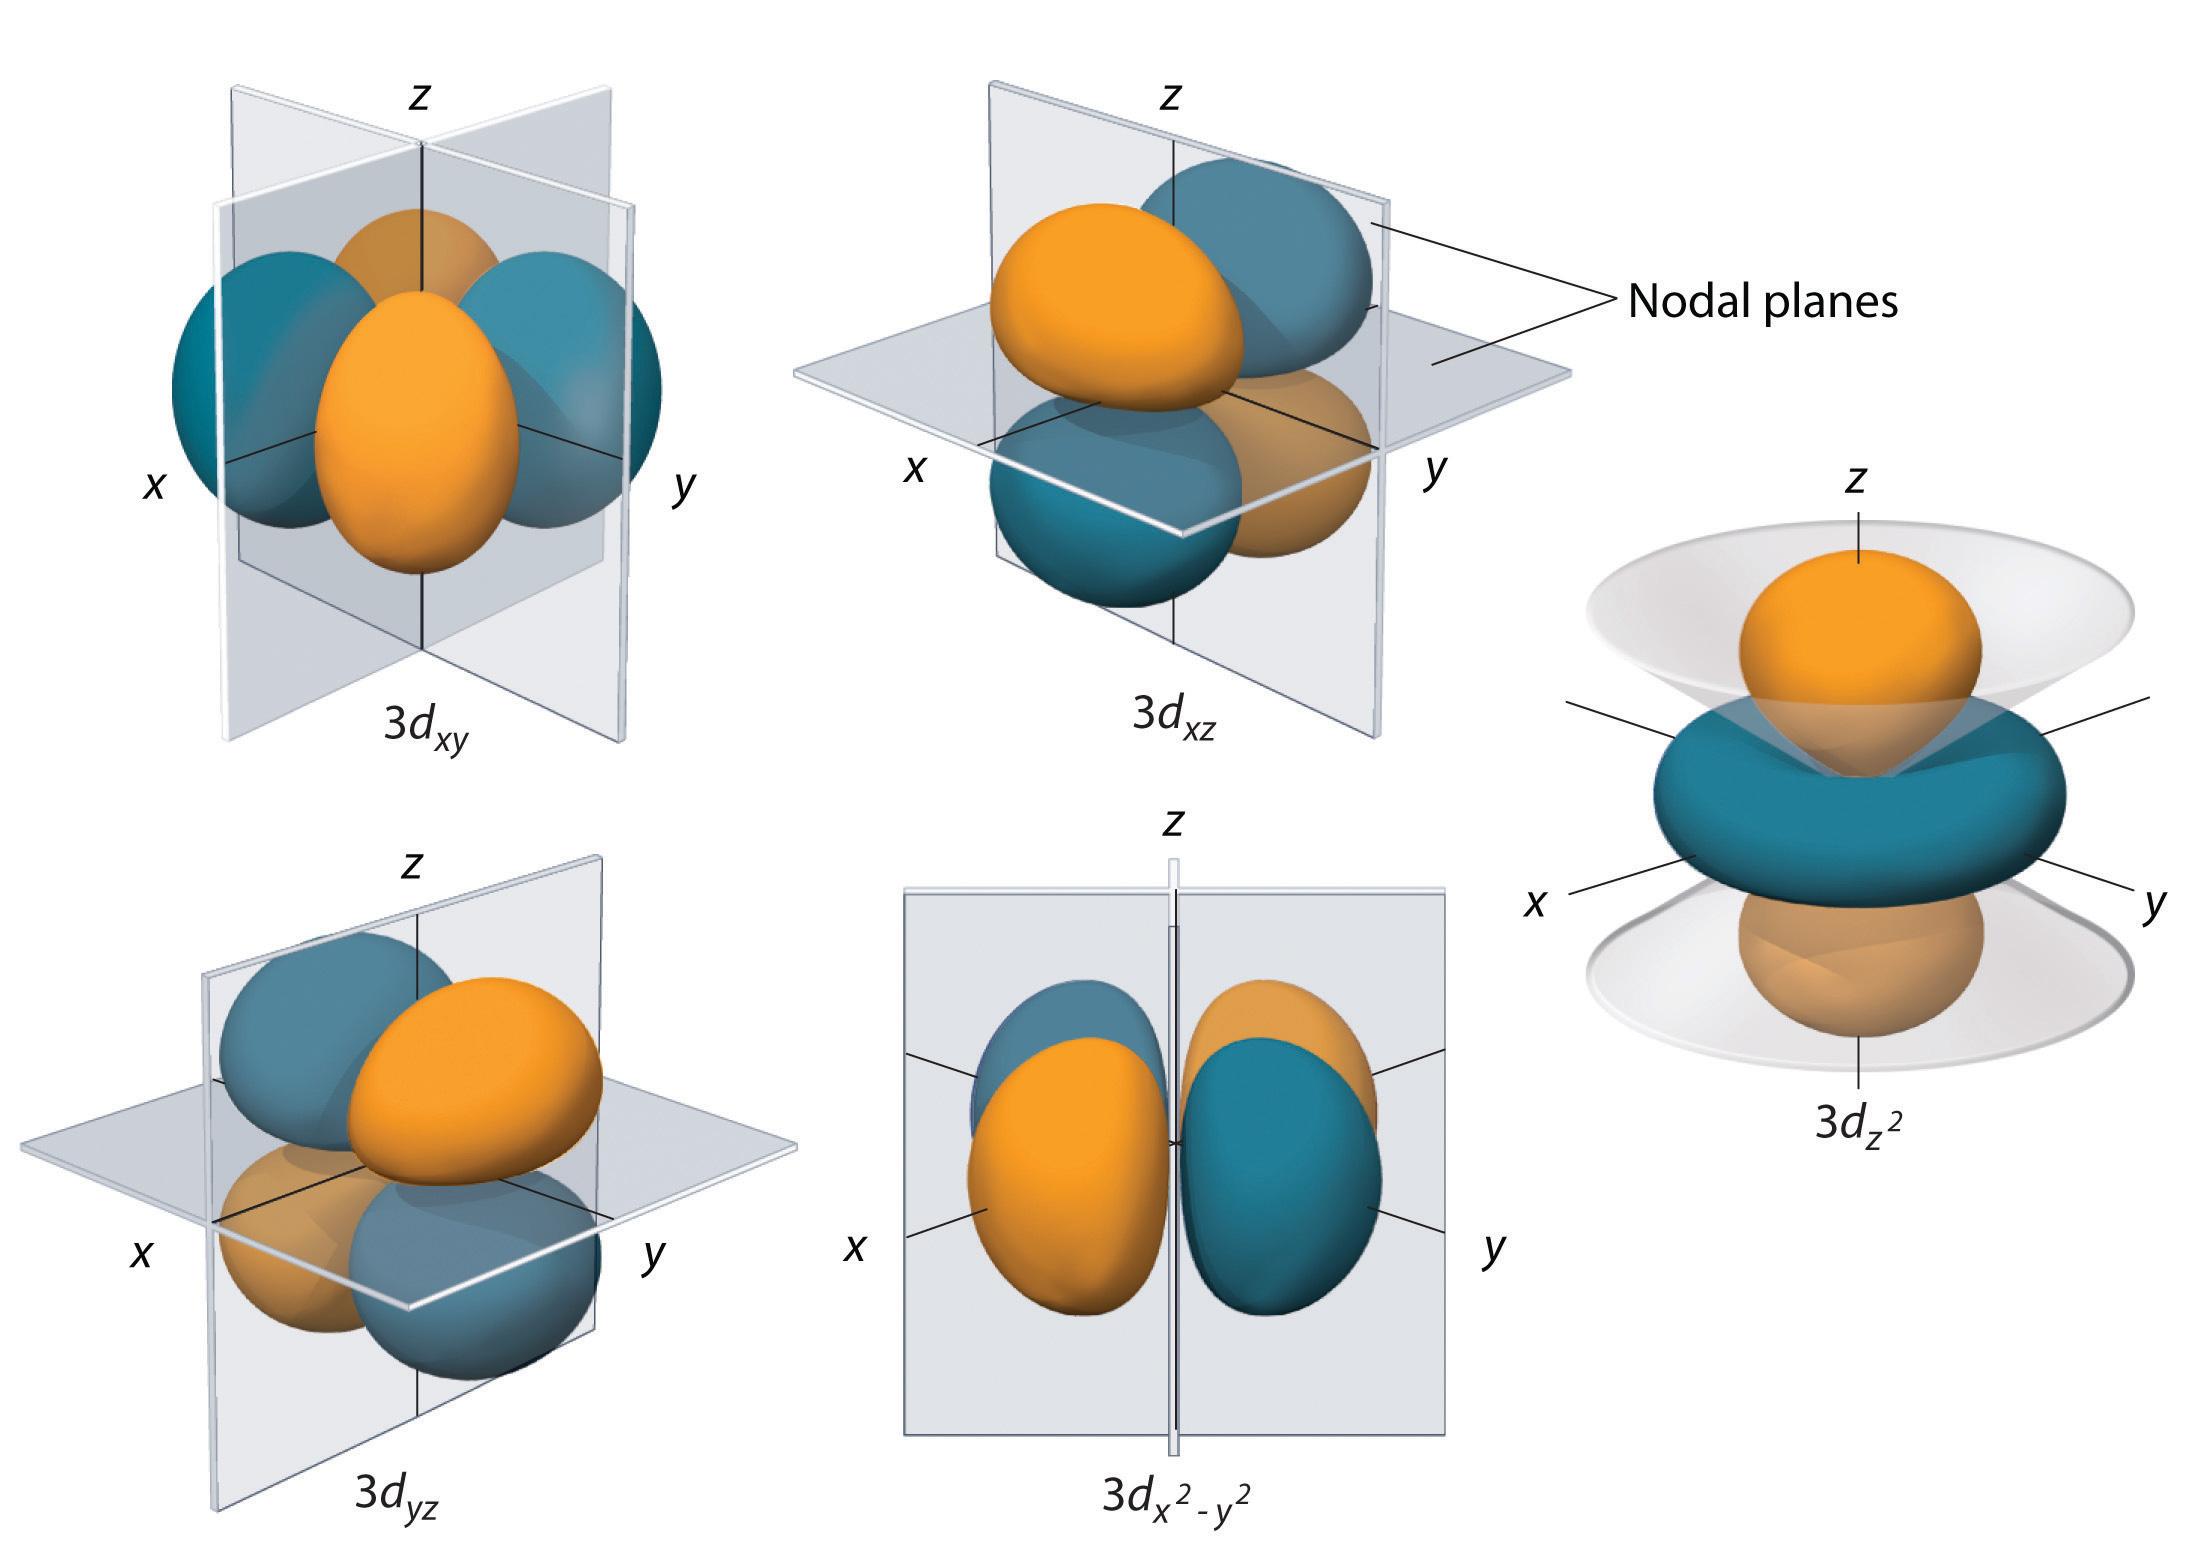 https://chem.libretexts.org/Textbook_Maps/General_Chemistry_Textbook_Maps